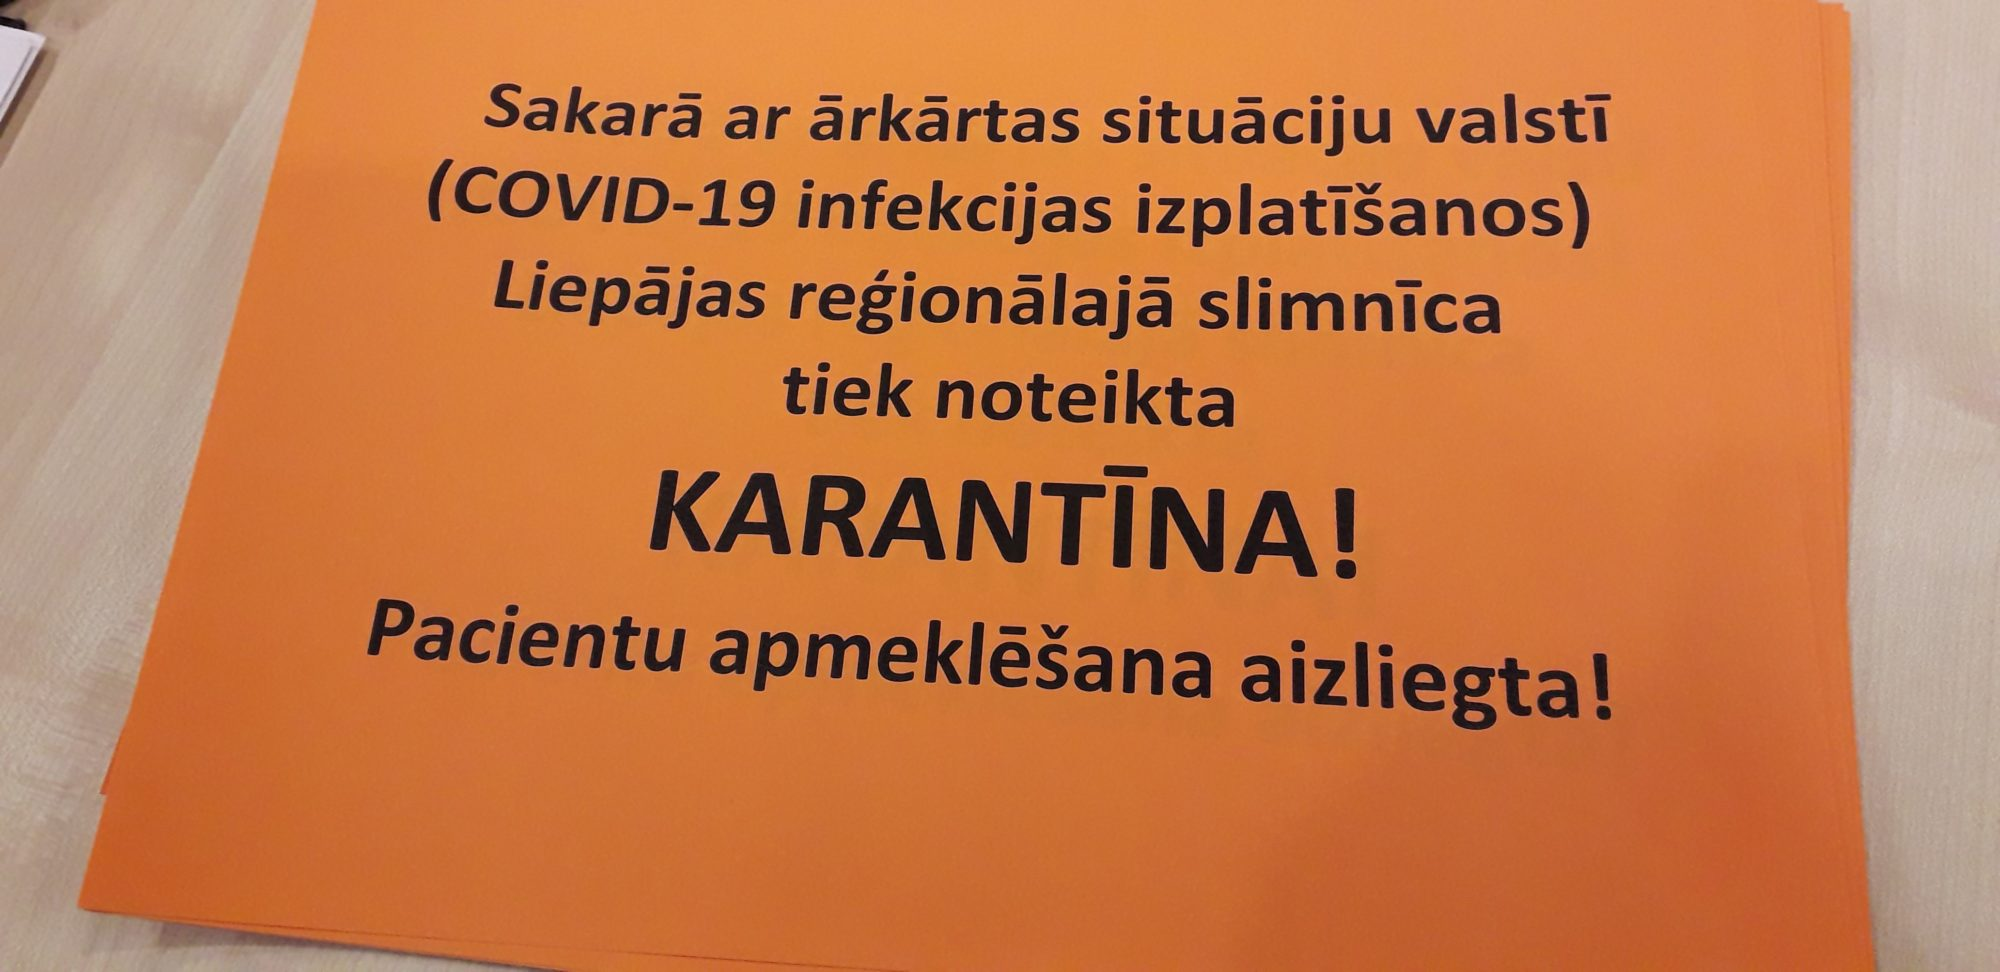 В больнице объявлен карантин